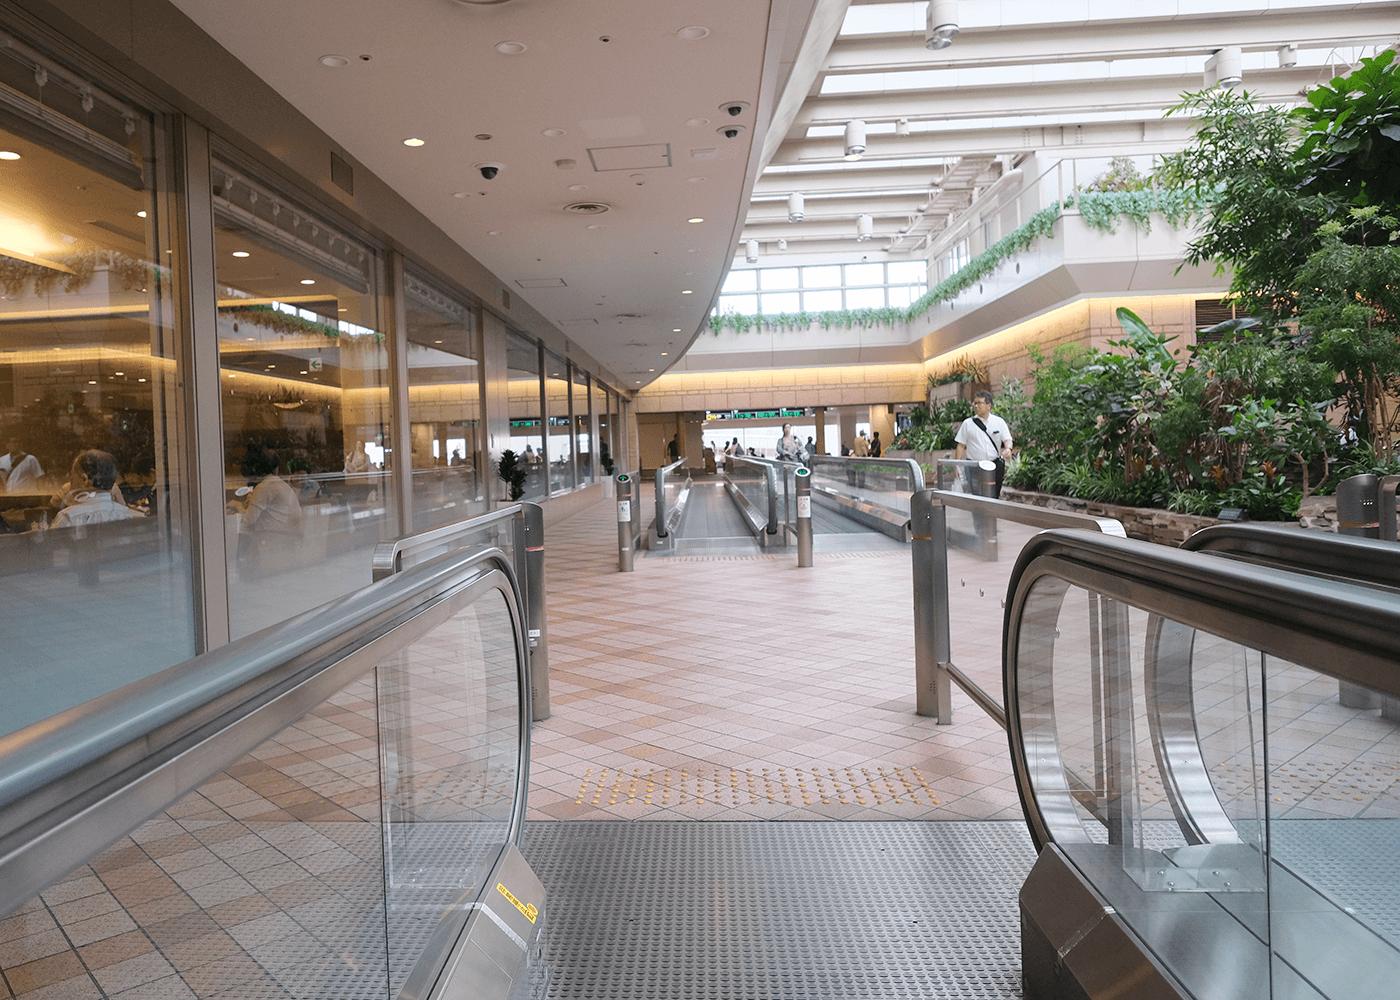 Japan Gourmet Port(ジャパングルメポート)@羽田空港第1ターミナル